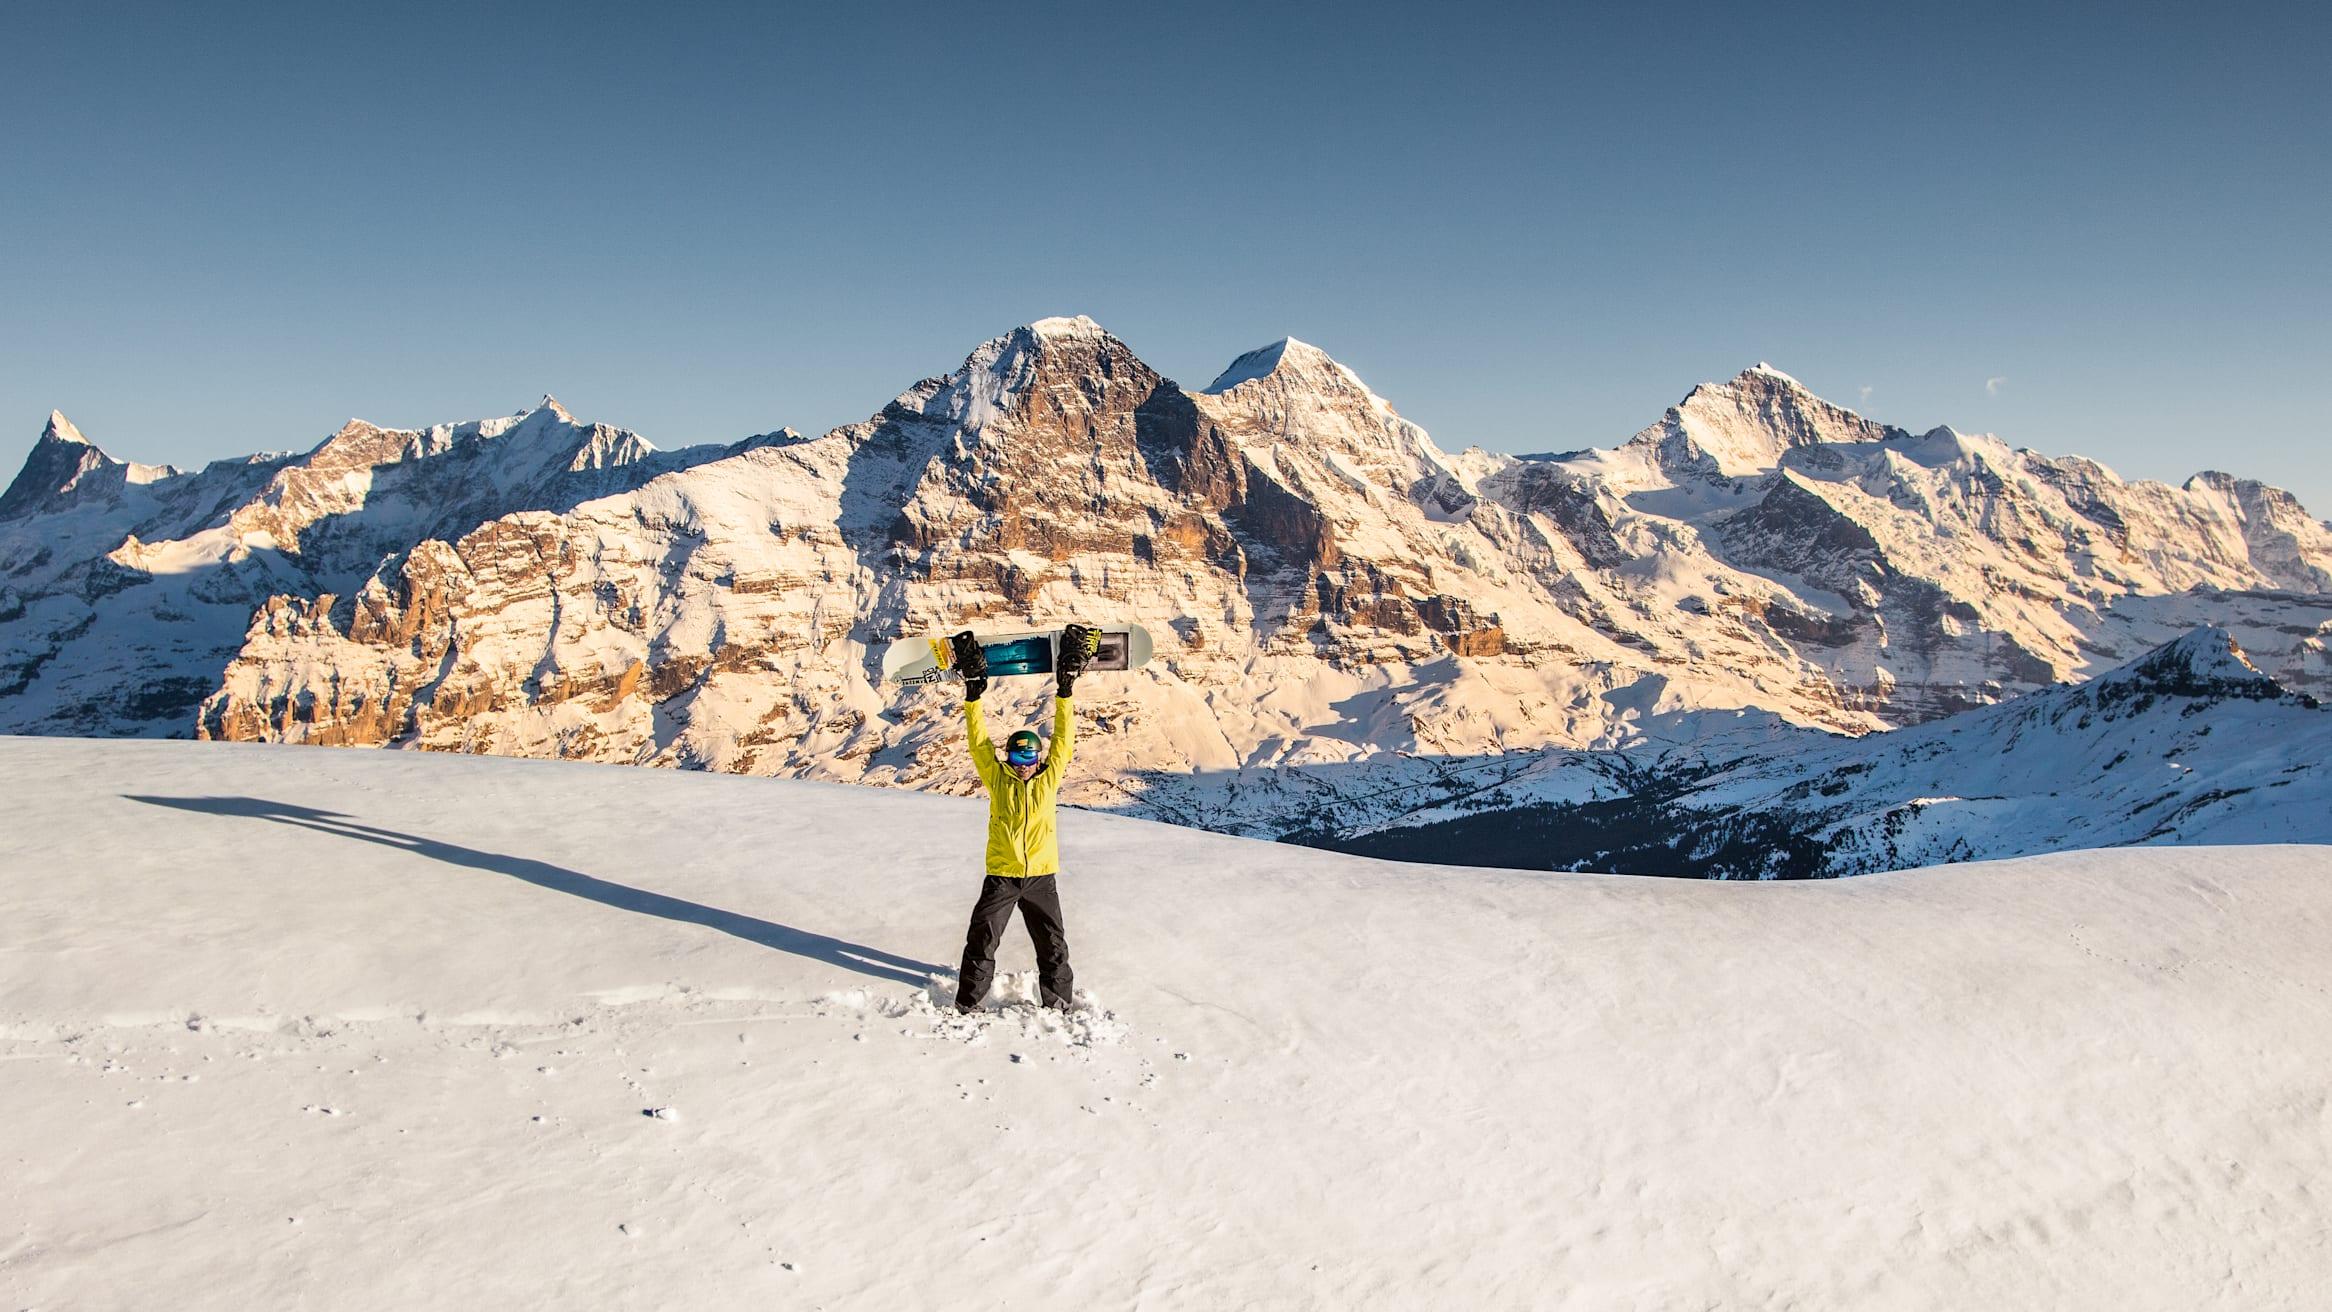 Jungfrau Ski Region Eiger Moench Jungfrau